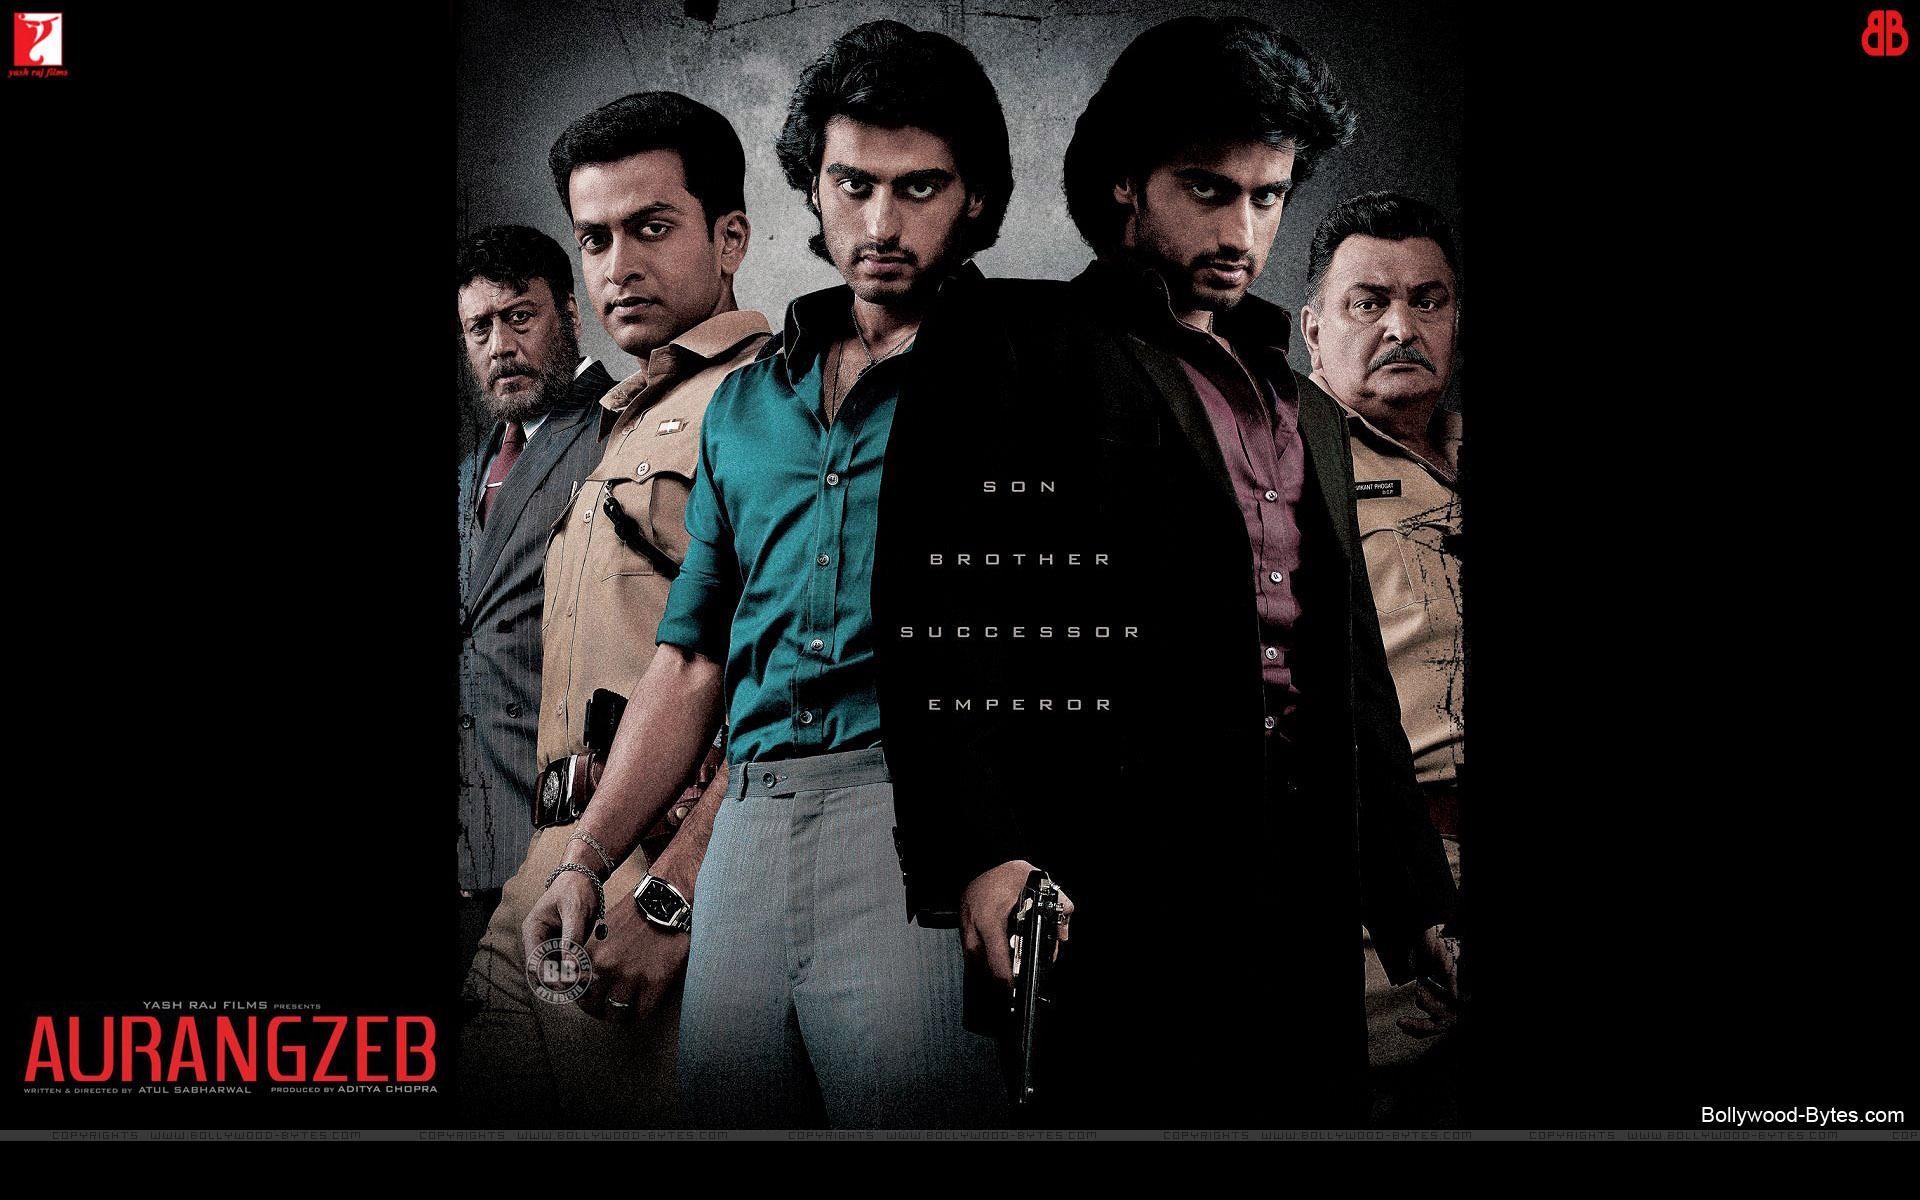 http://1.bp.blogspot.com/-G3nWnbFkKvQ/UUgOU0Pa4KI/AAAAAAAAcro/YxVNxiN4cSc/s1920/Aurangzeb-+Hot-Arjun-Kapoor-Prithviraj-Sukumaran-Rishi-Kapoor-Jackie-Shroff-HD-Wallpaper-01.jpg